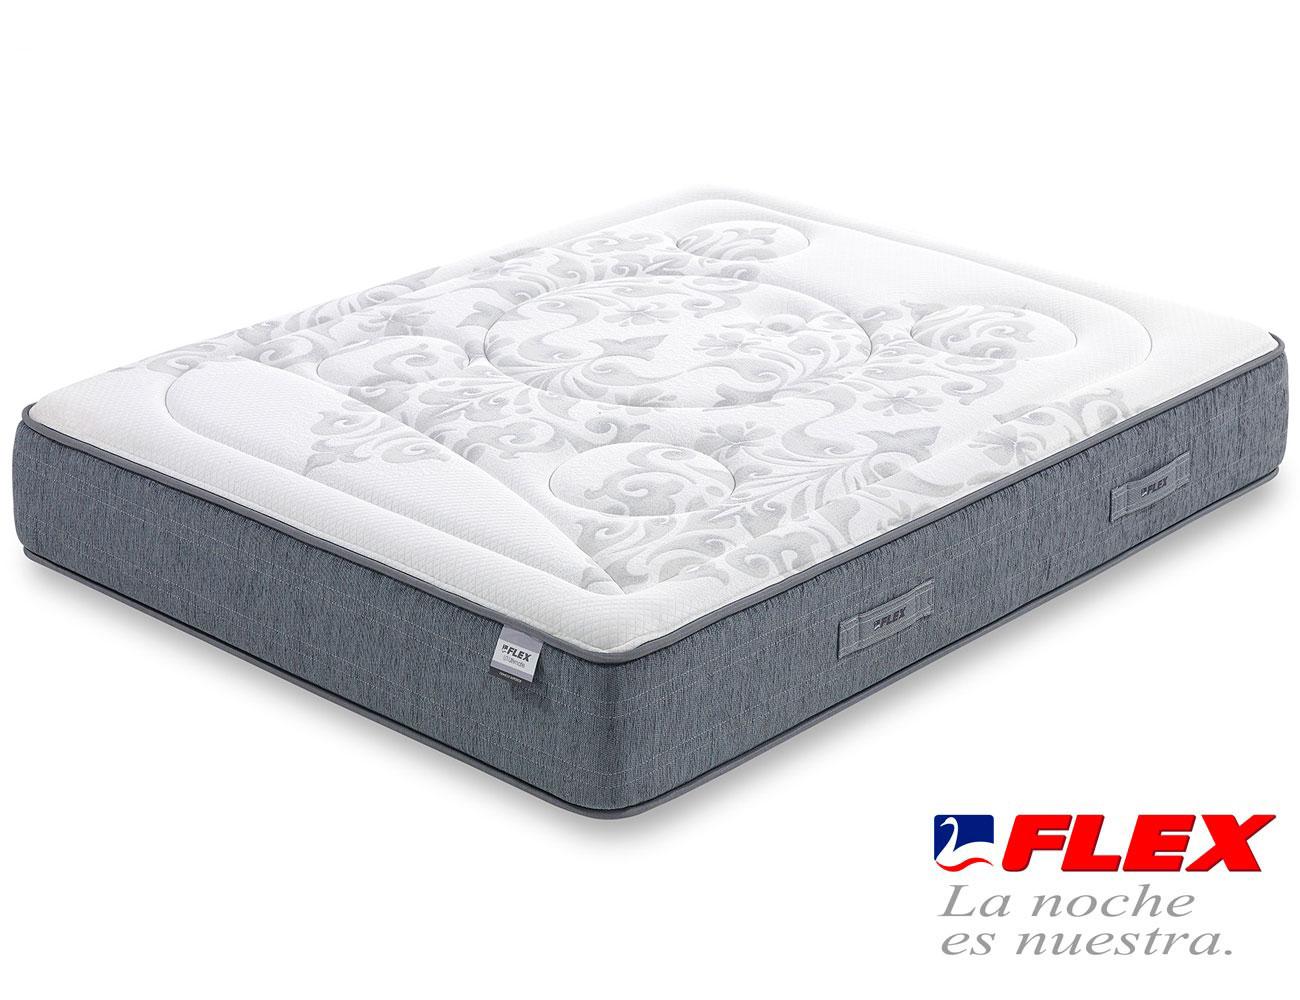 Colchon flex airvex viscoelastica gel garbi superior17